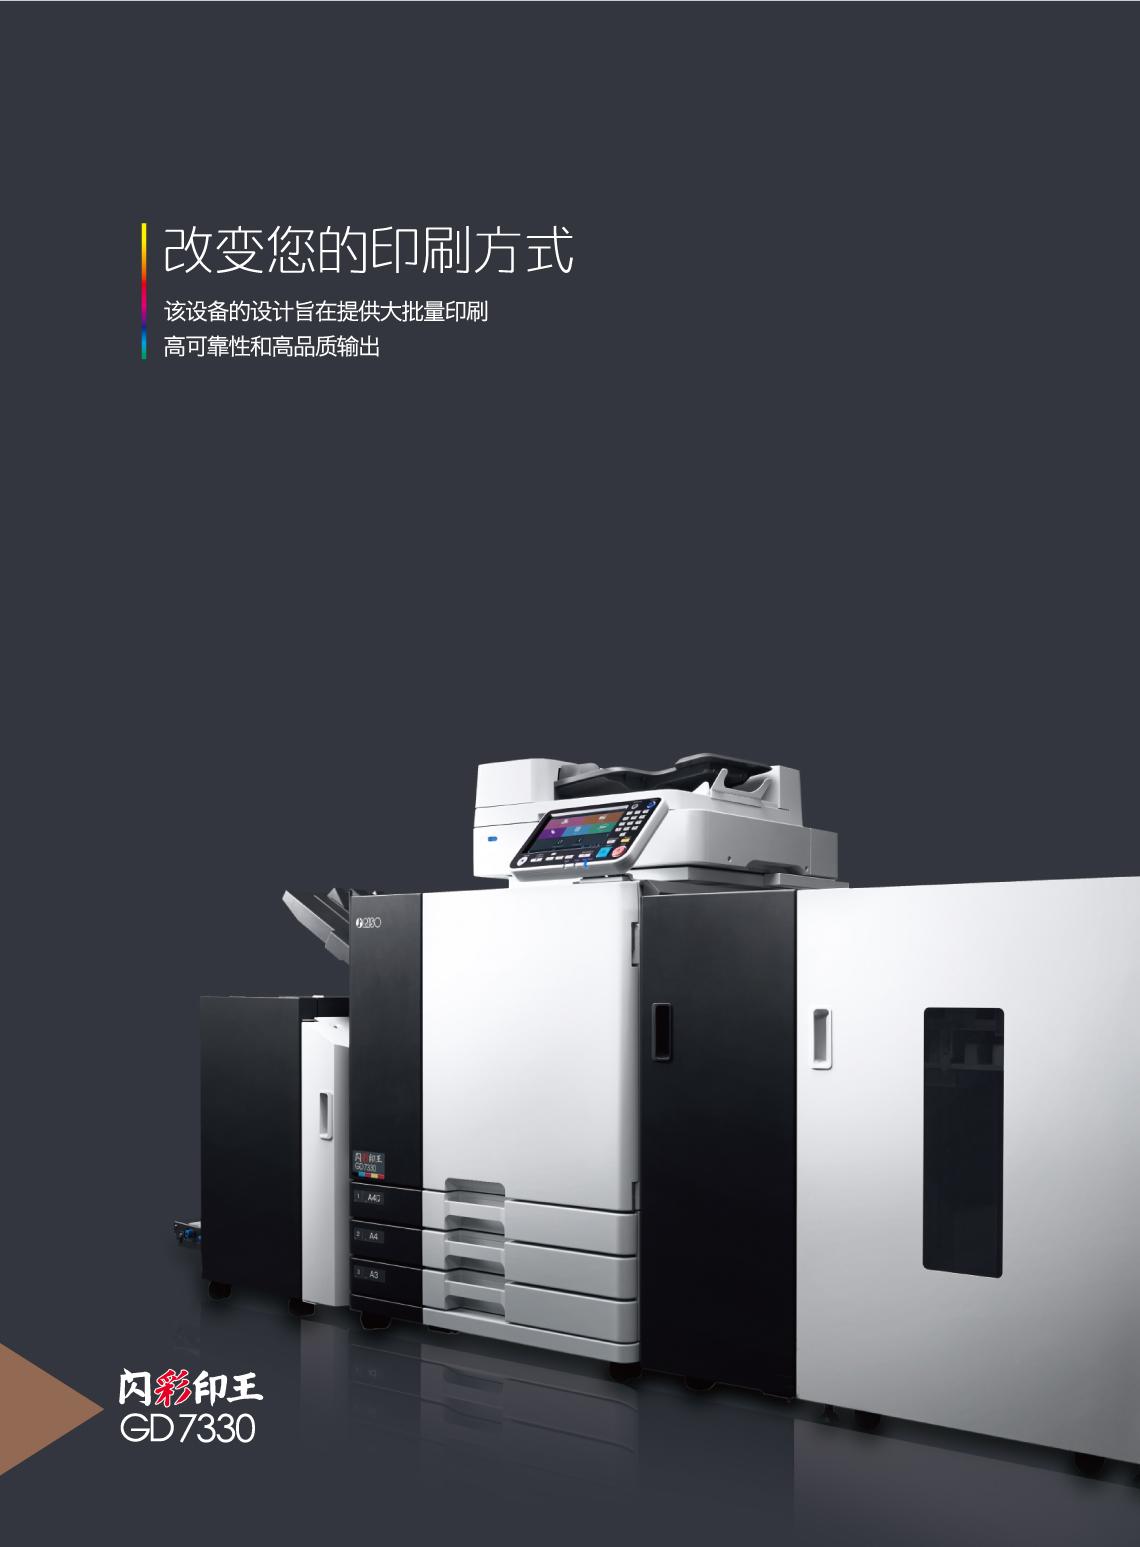 GD7330-2.jpg